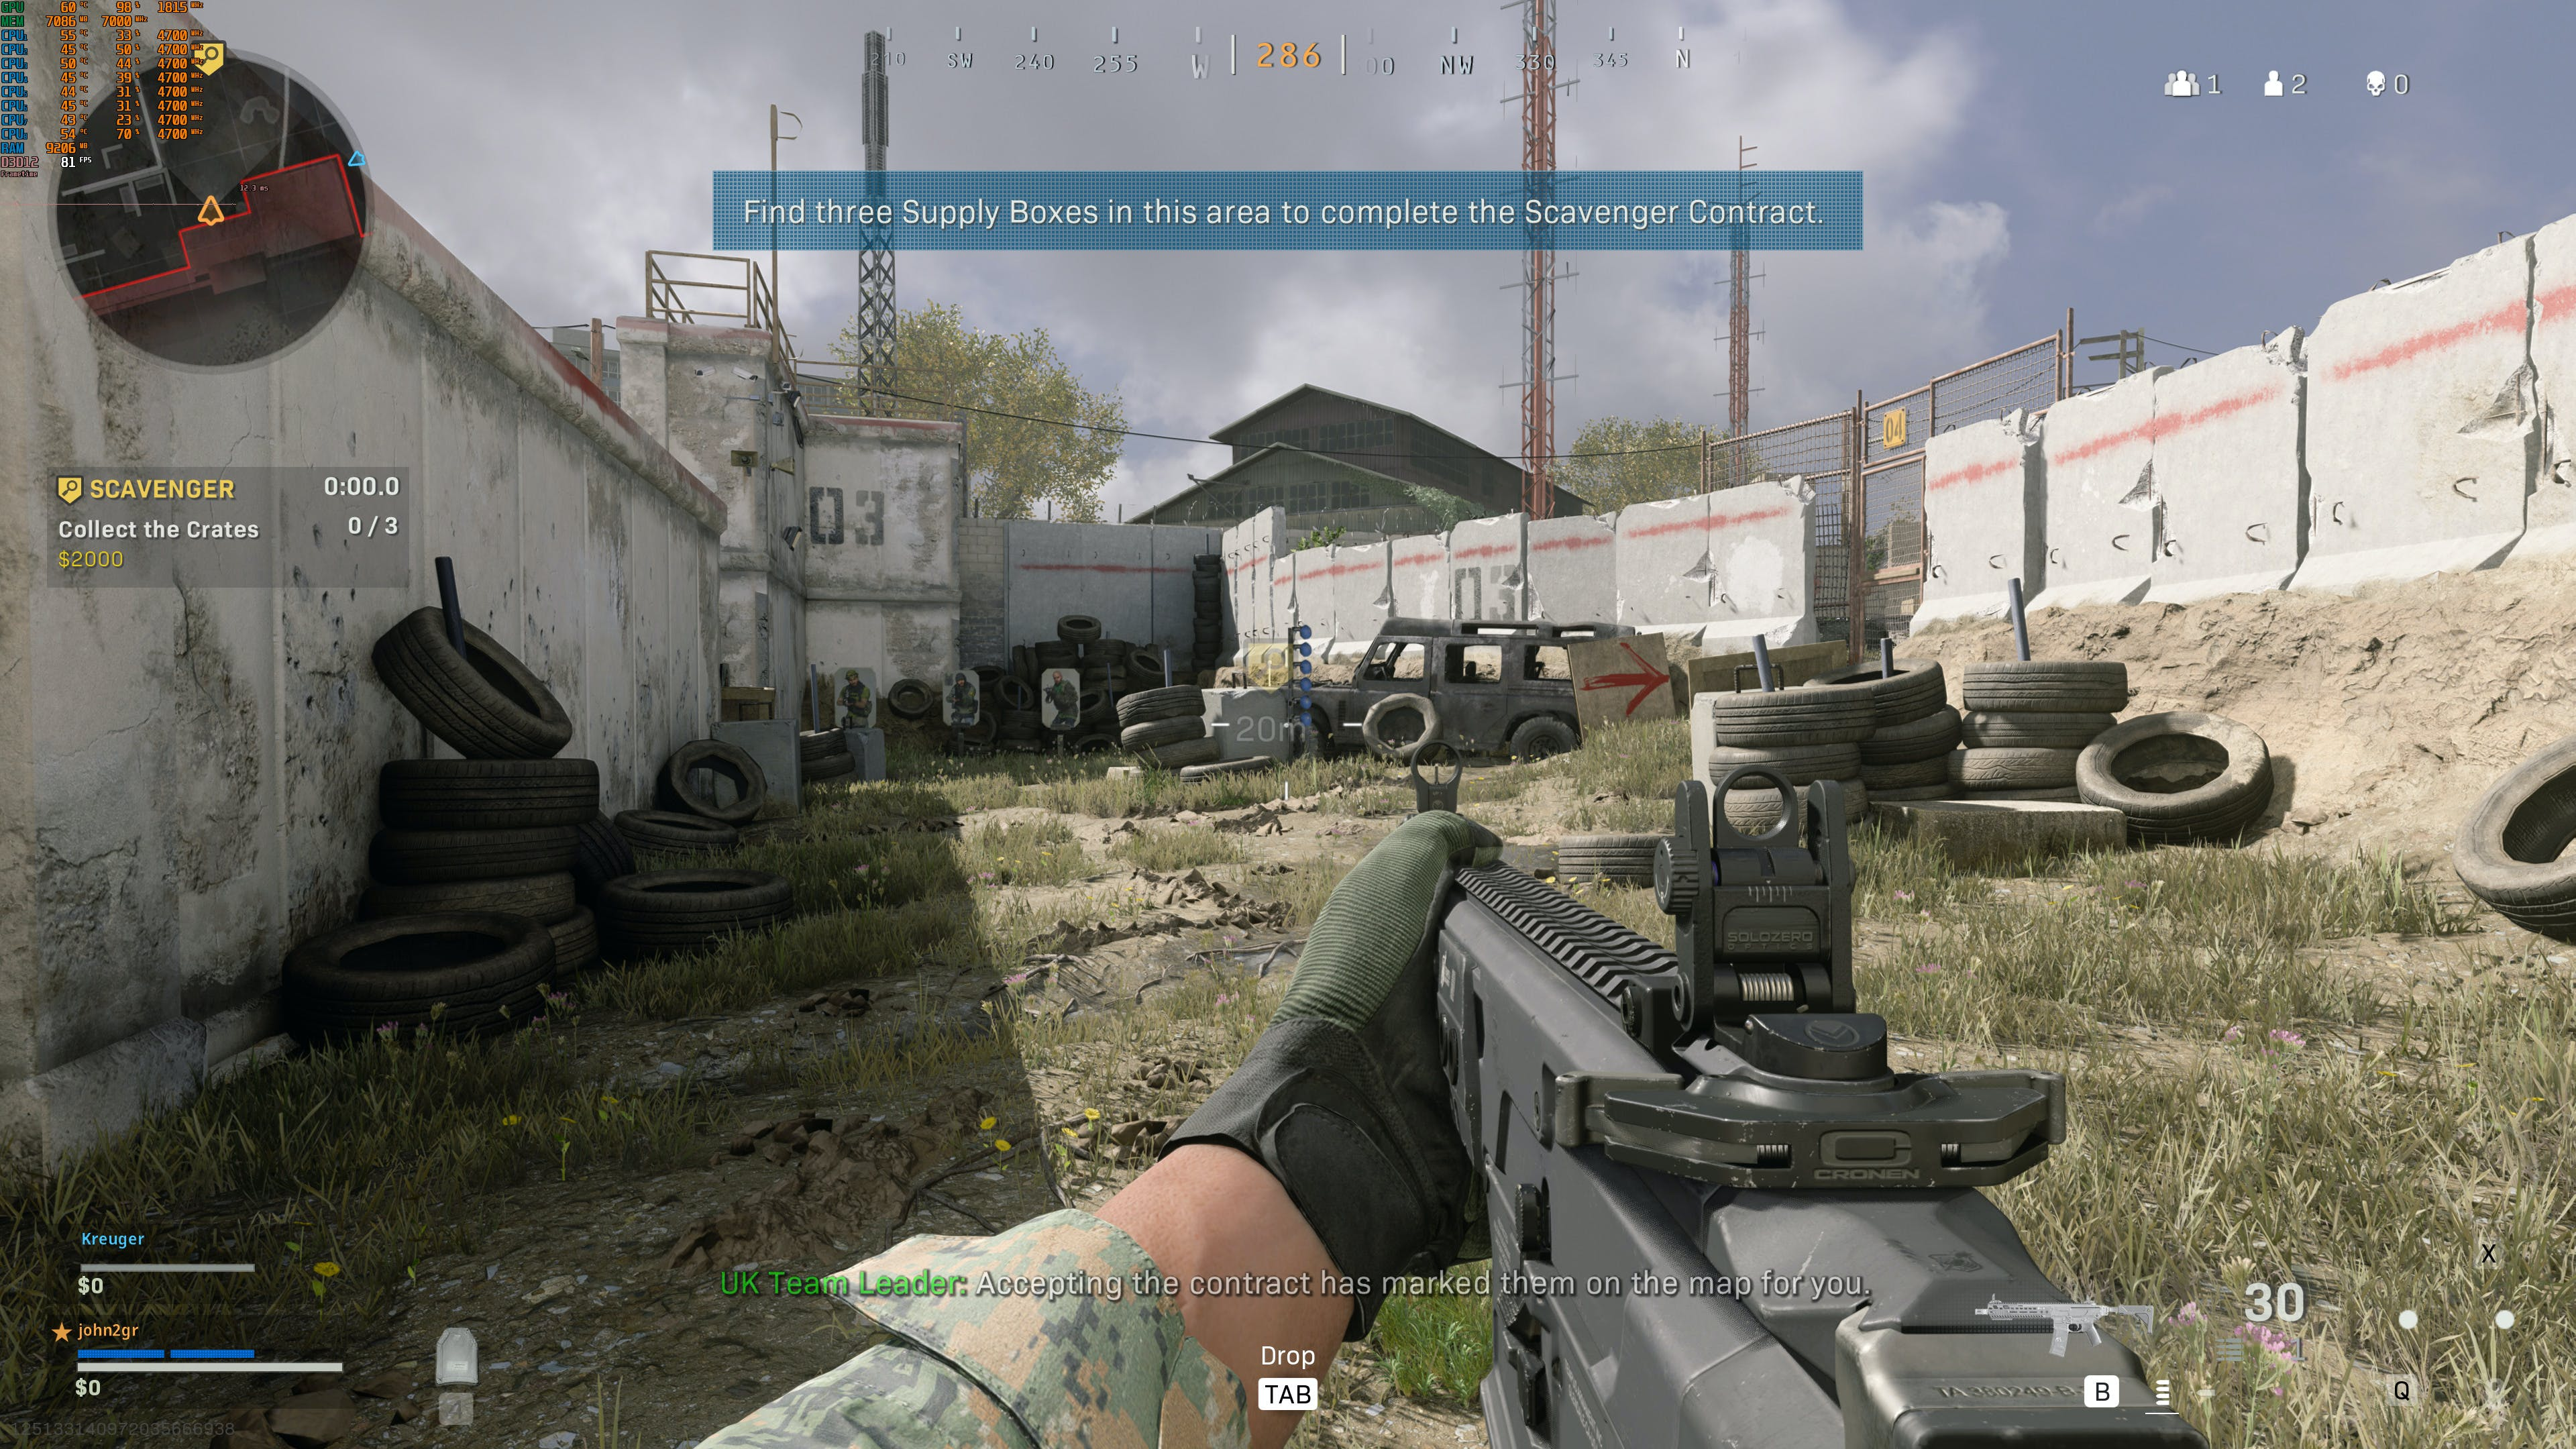 Warzone Gameplay Image 1